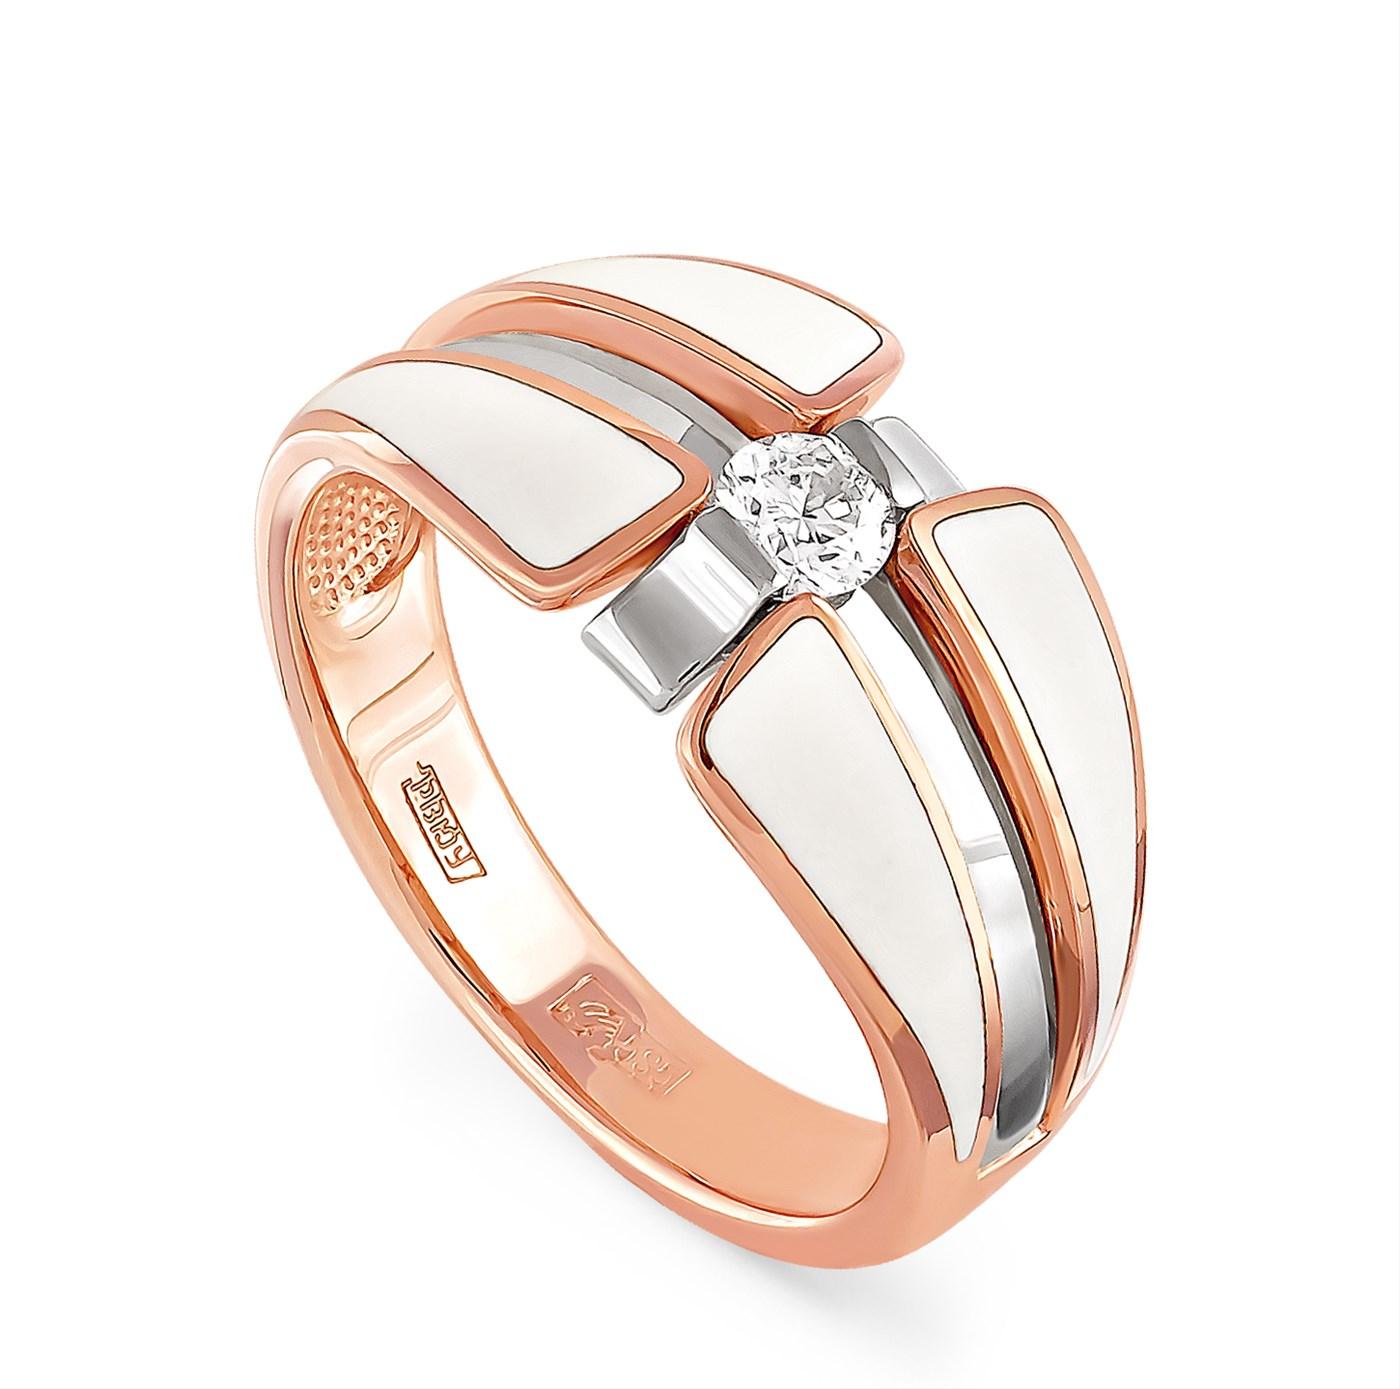 Золотое кольцо Бриллиант арт. 11-0249-1002 11-0249-1002